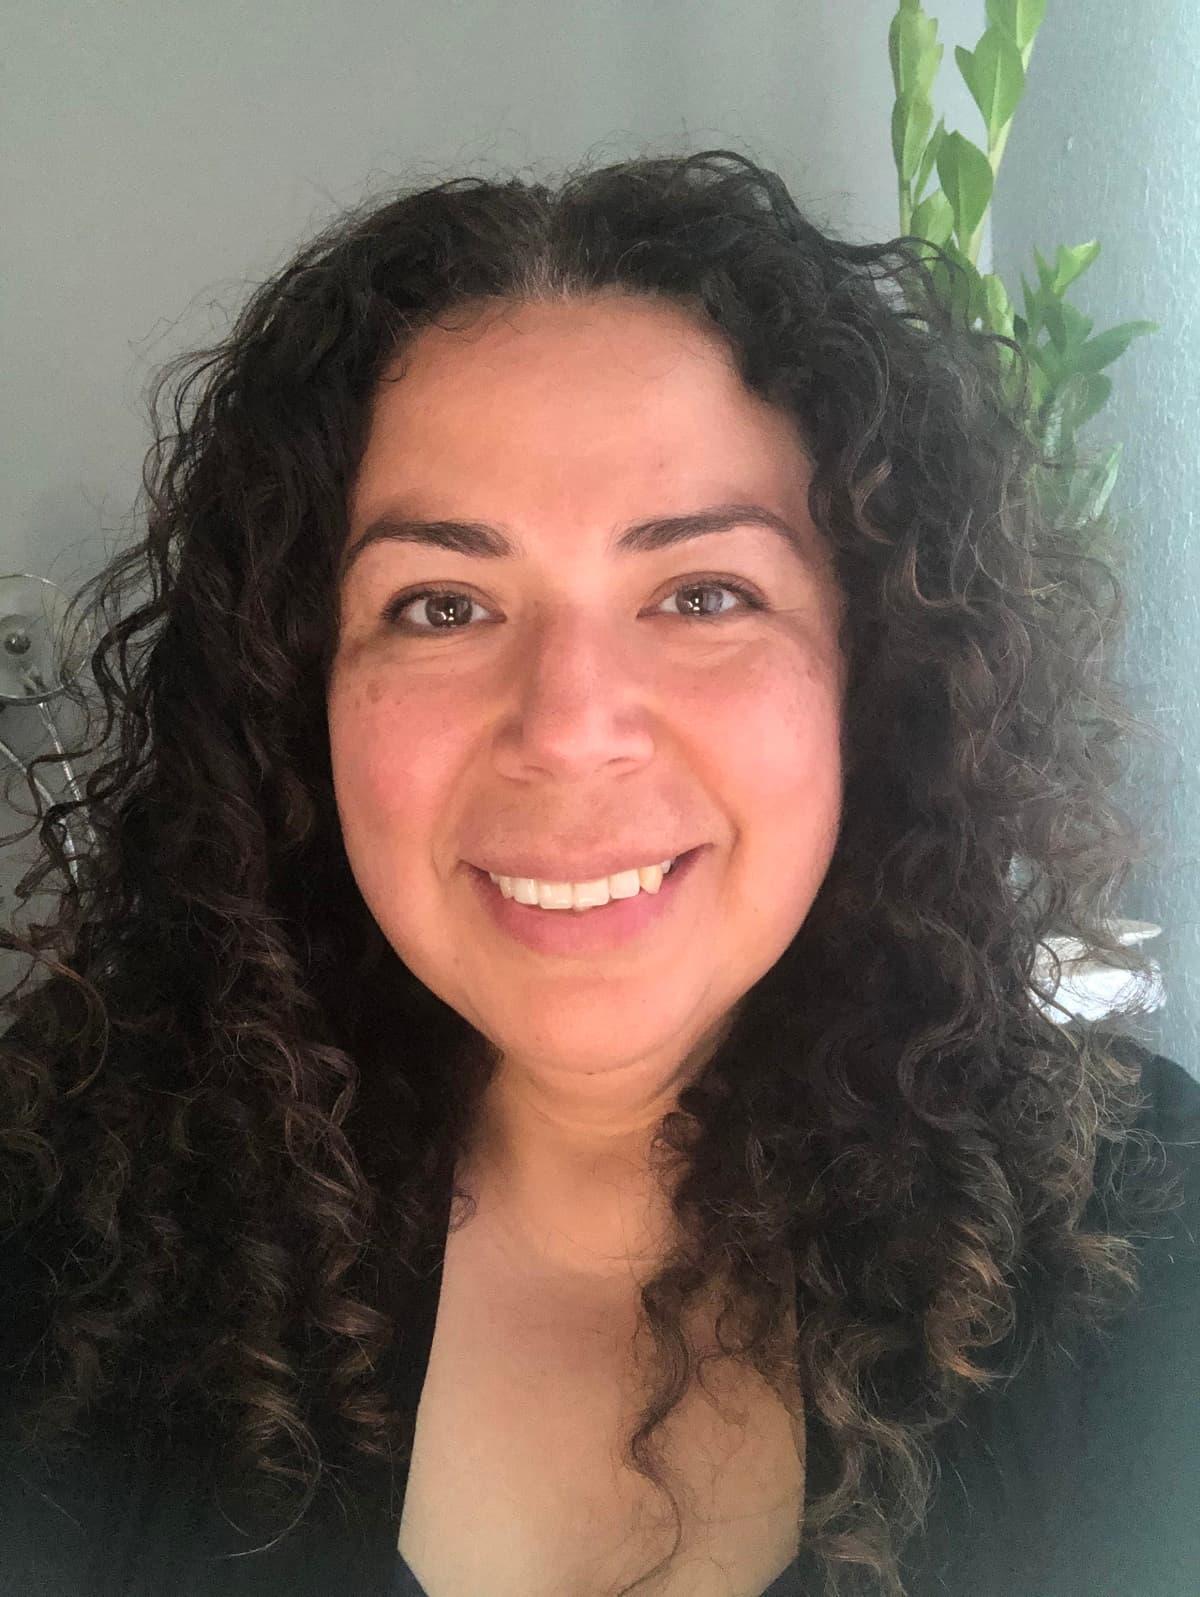 Norma Aguilar